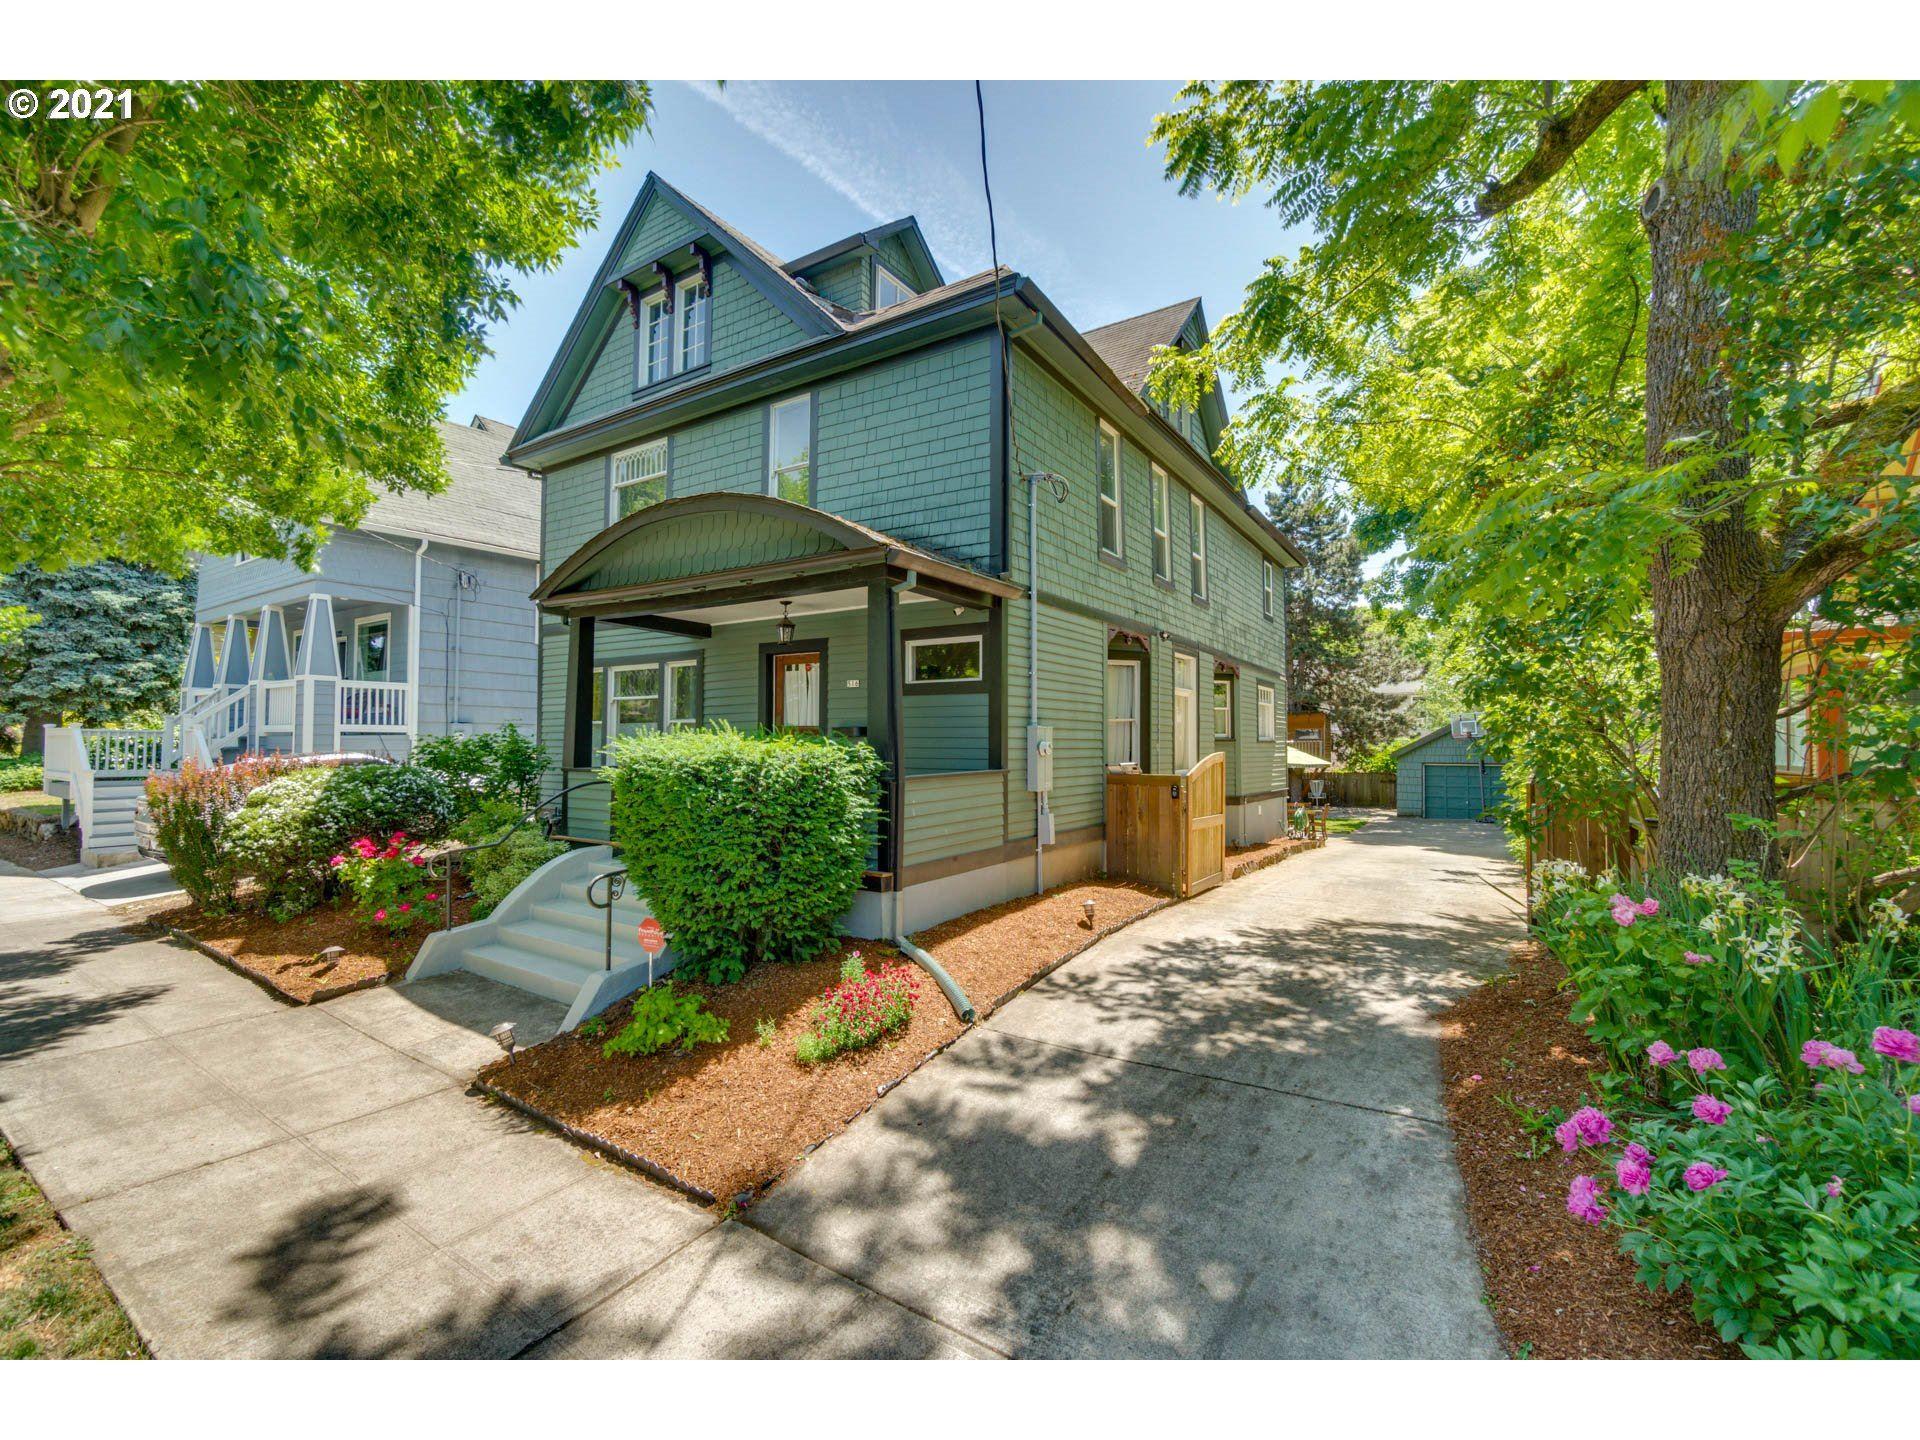 516 NE MORRIS ST, Portland, OR 97212 - MLS#: 21046820